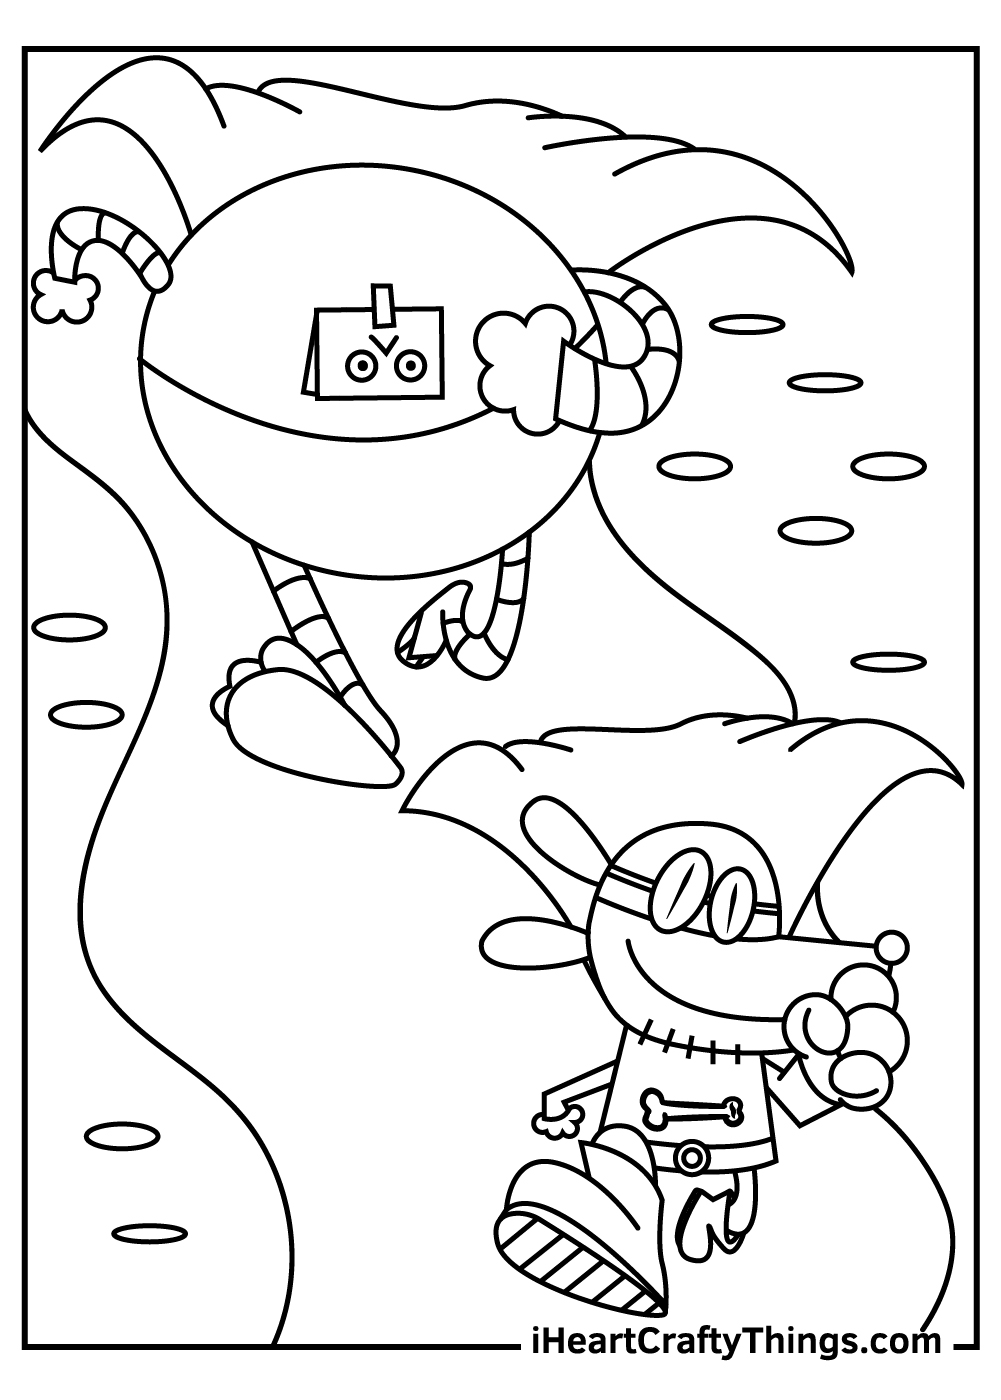 dog man coloring pages free pdf download